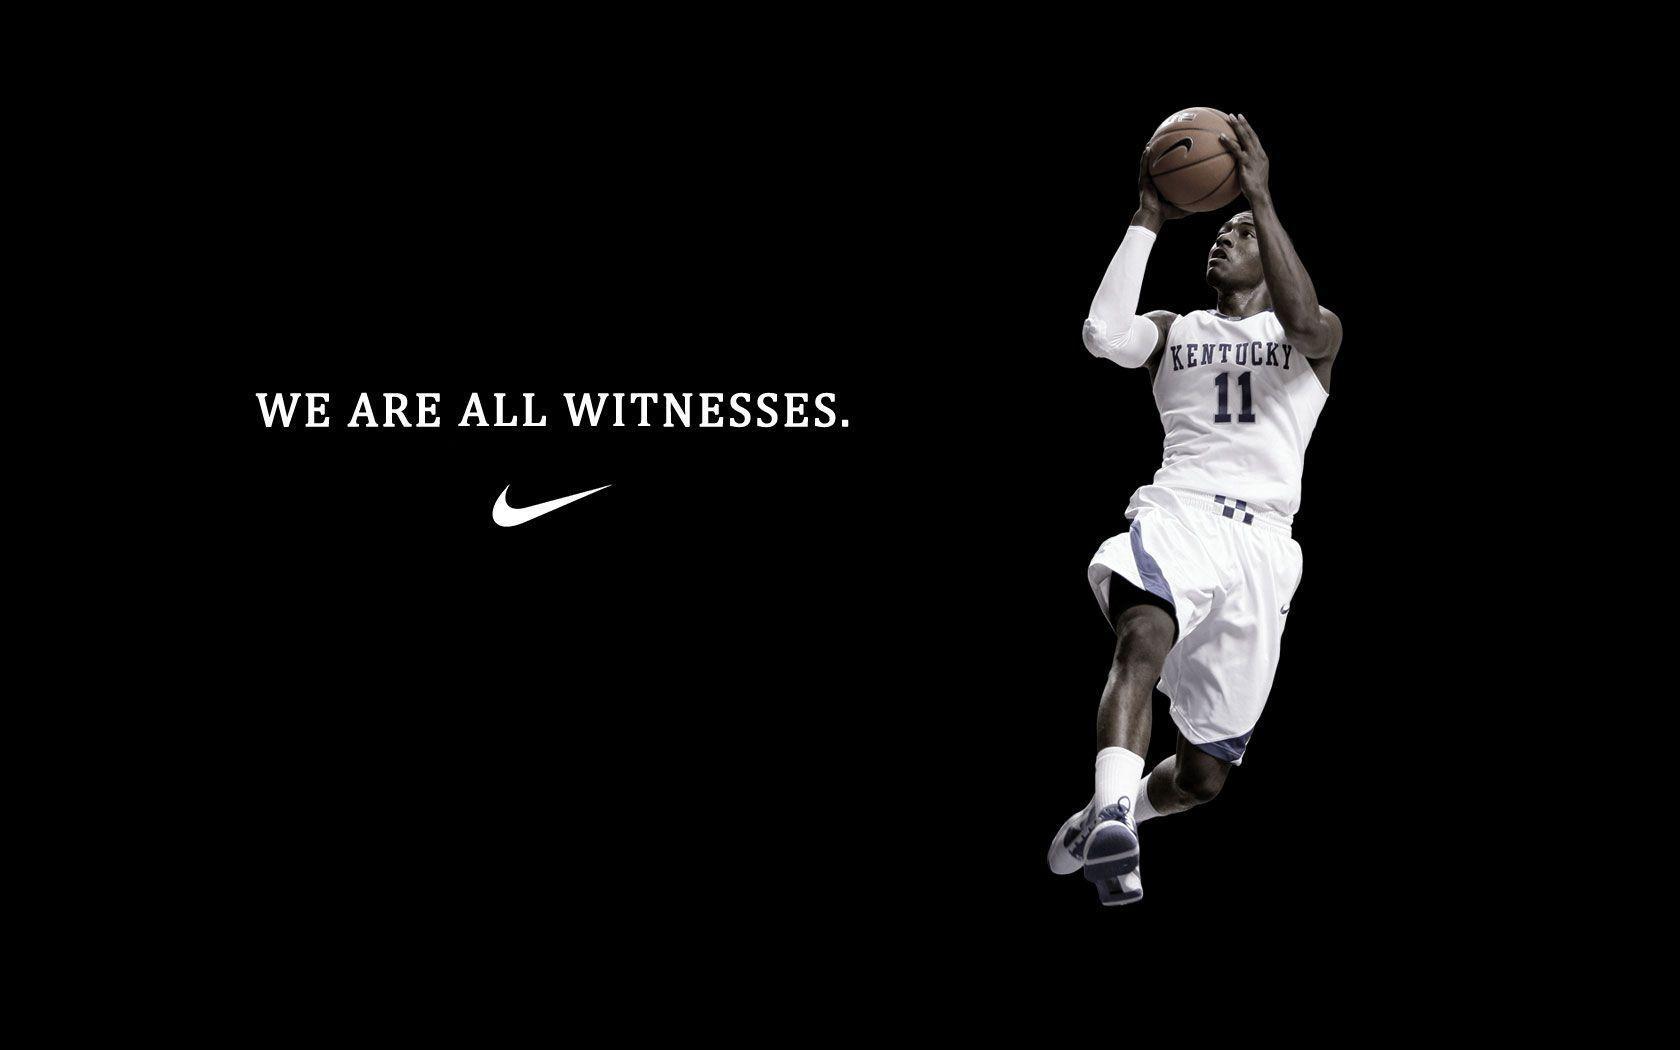 Nike Nba Wallpapers Quotes: HD Wallpapers Basketball